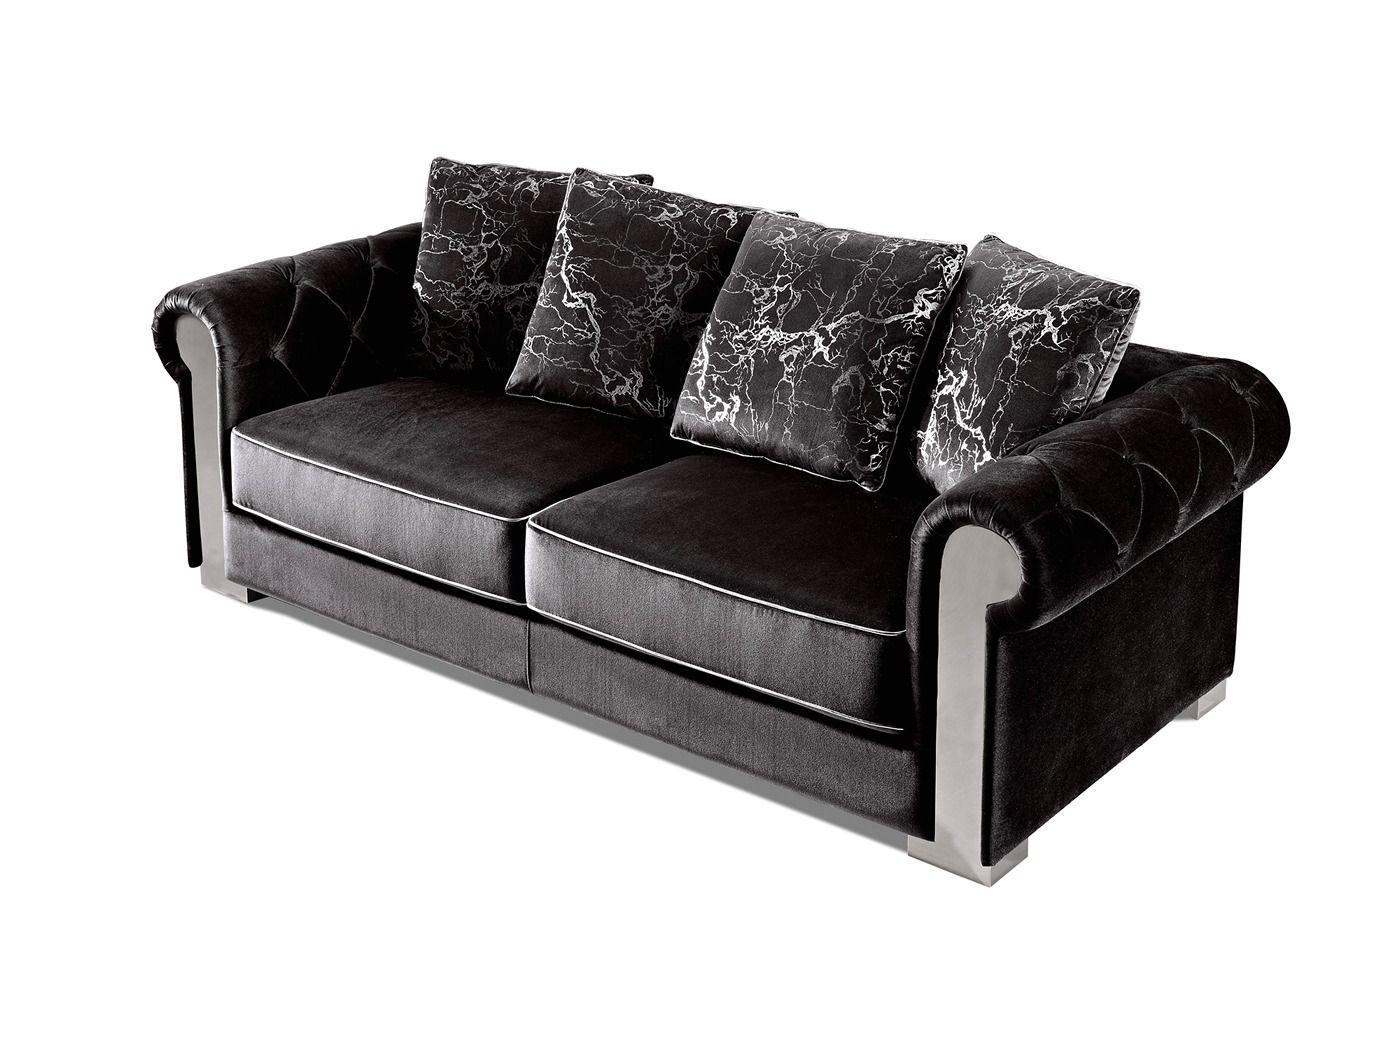 Us Pride Furniture Rivian Black Velvet Sofa Bed Slepper With Mattress S5596 The Home Depot Us Pride Furni In 2020 Black Velvet Sofa Velvet Sofa Bed Cushions On Sofa